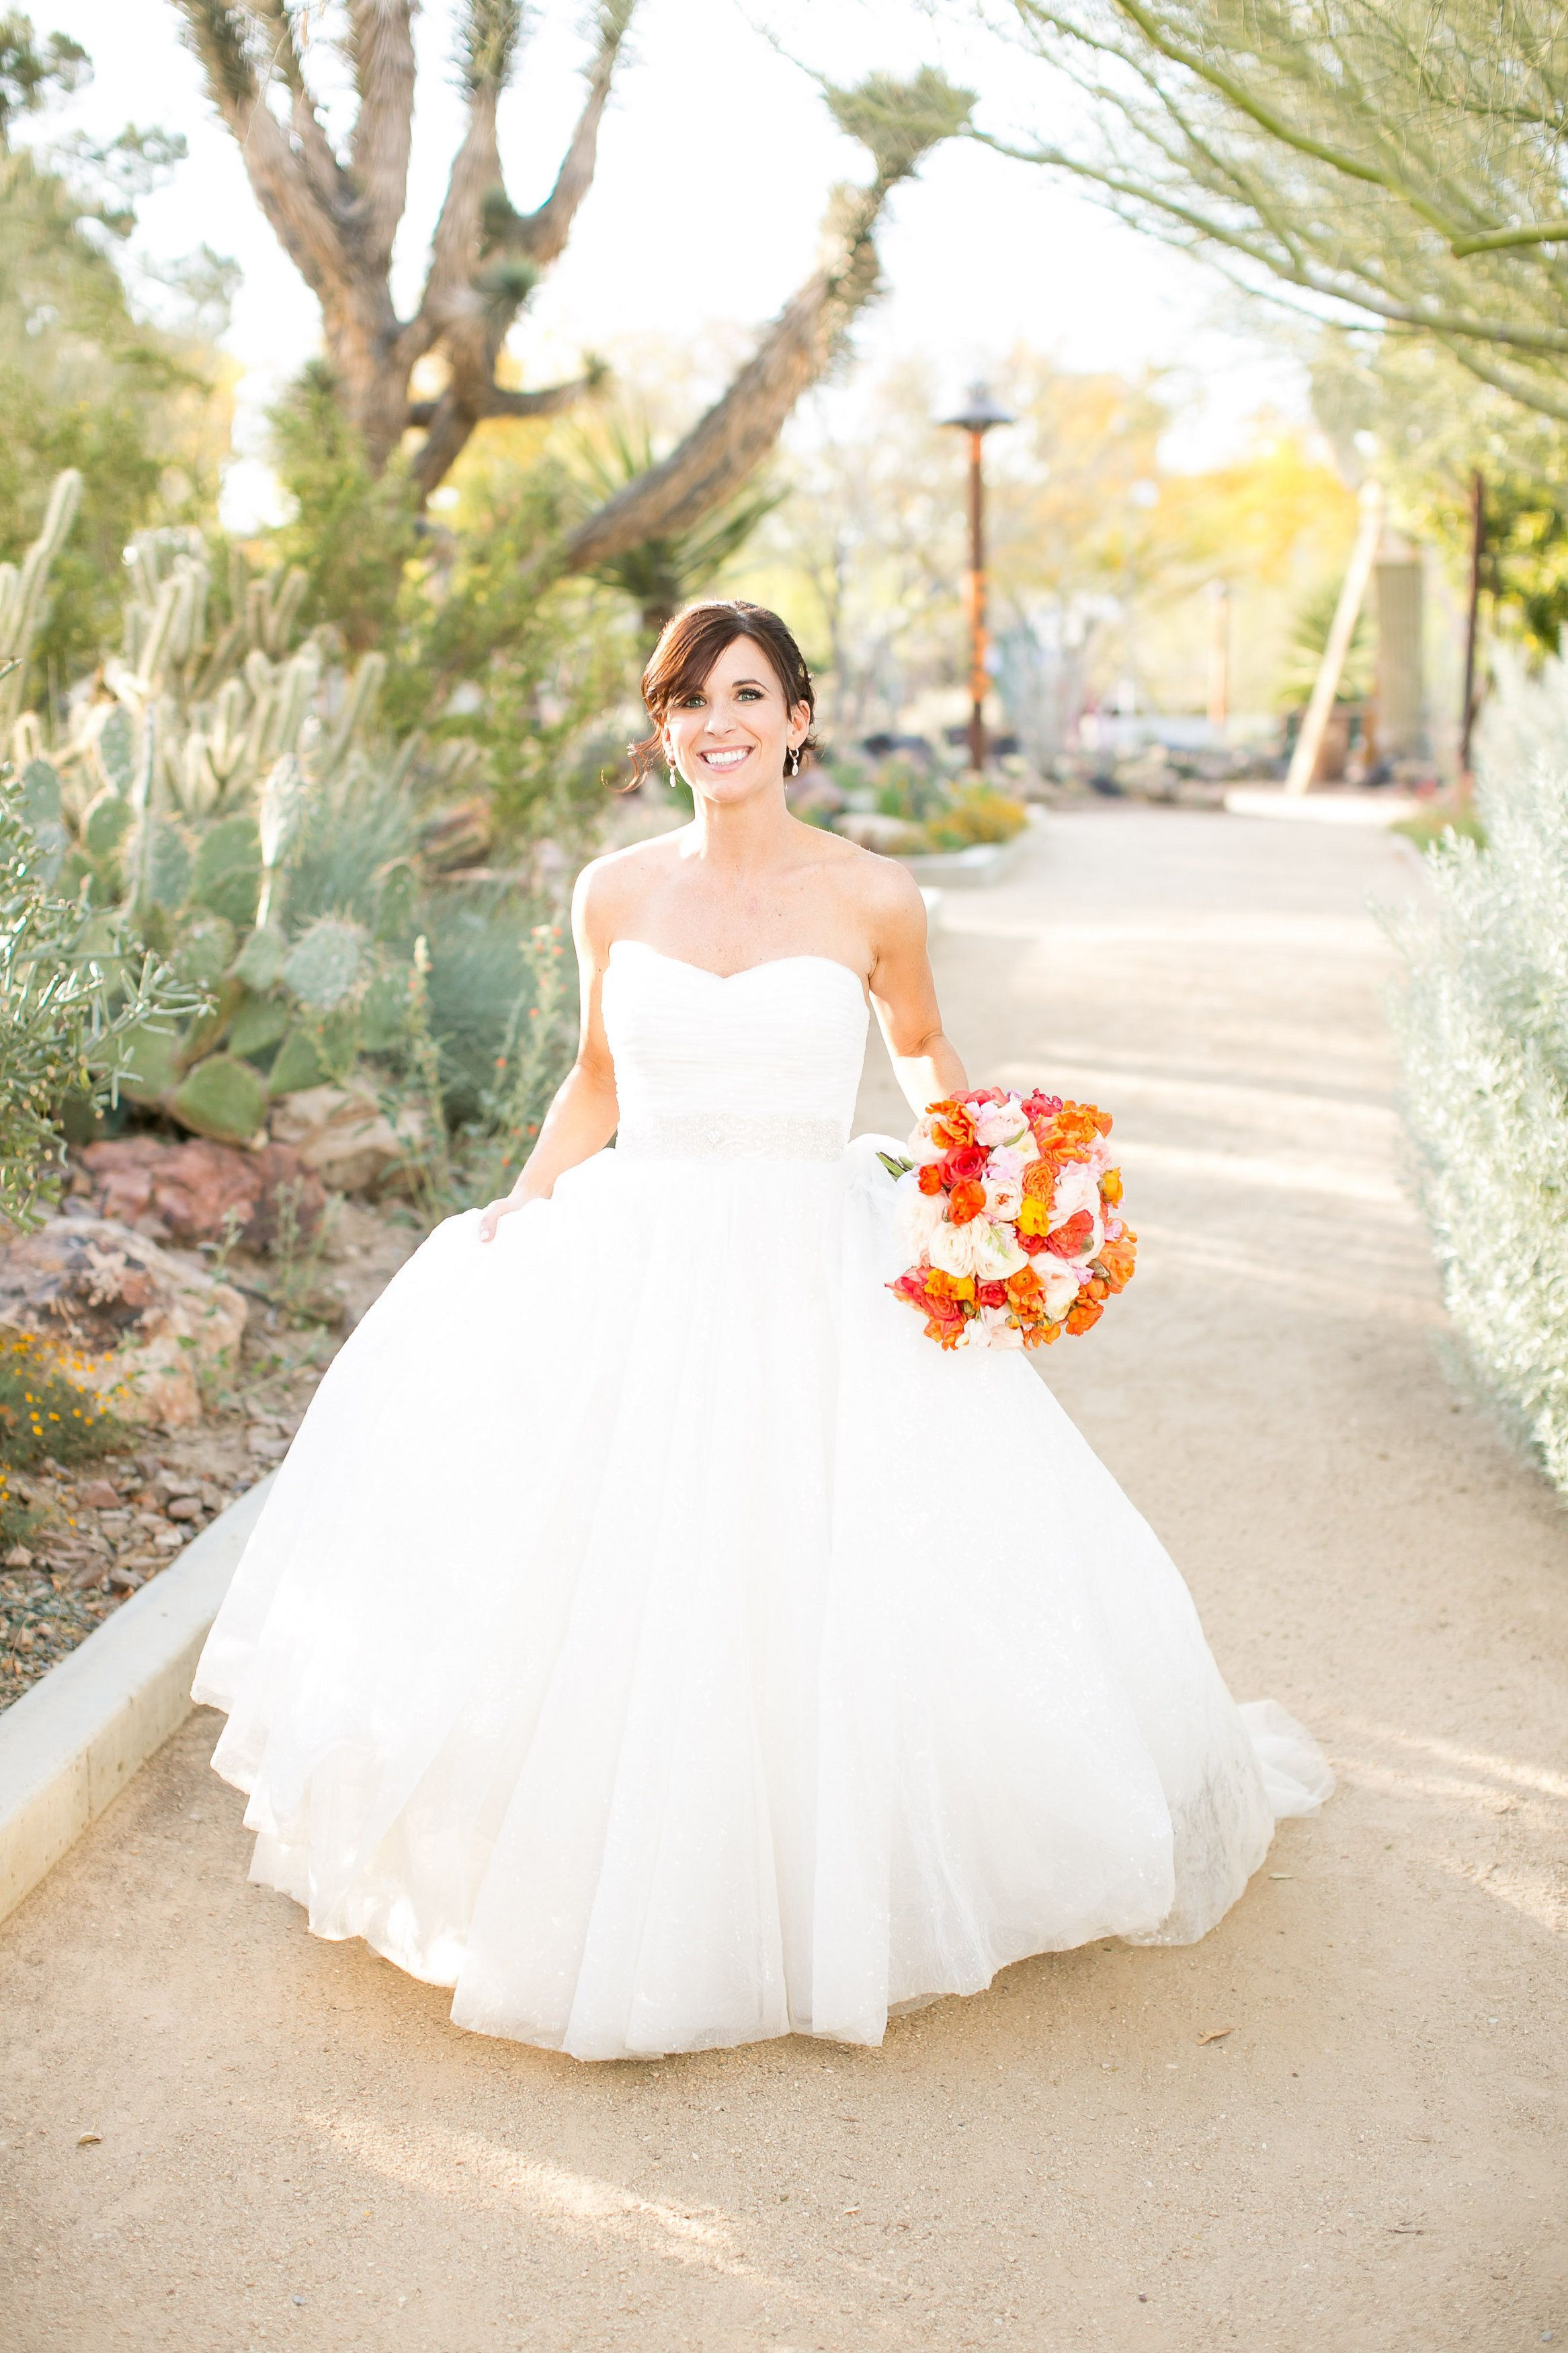 Modern, Colorful Las Vegas Wedding Wedding gown